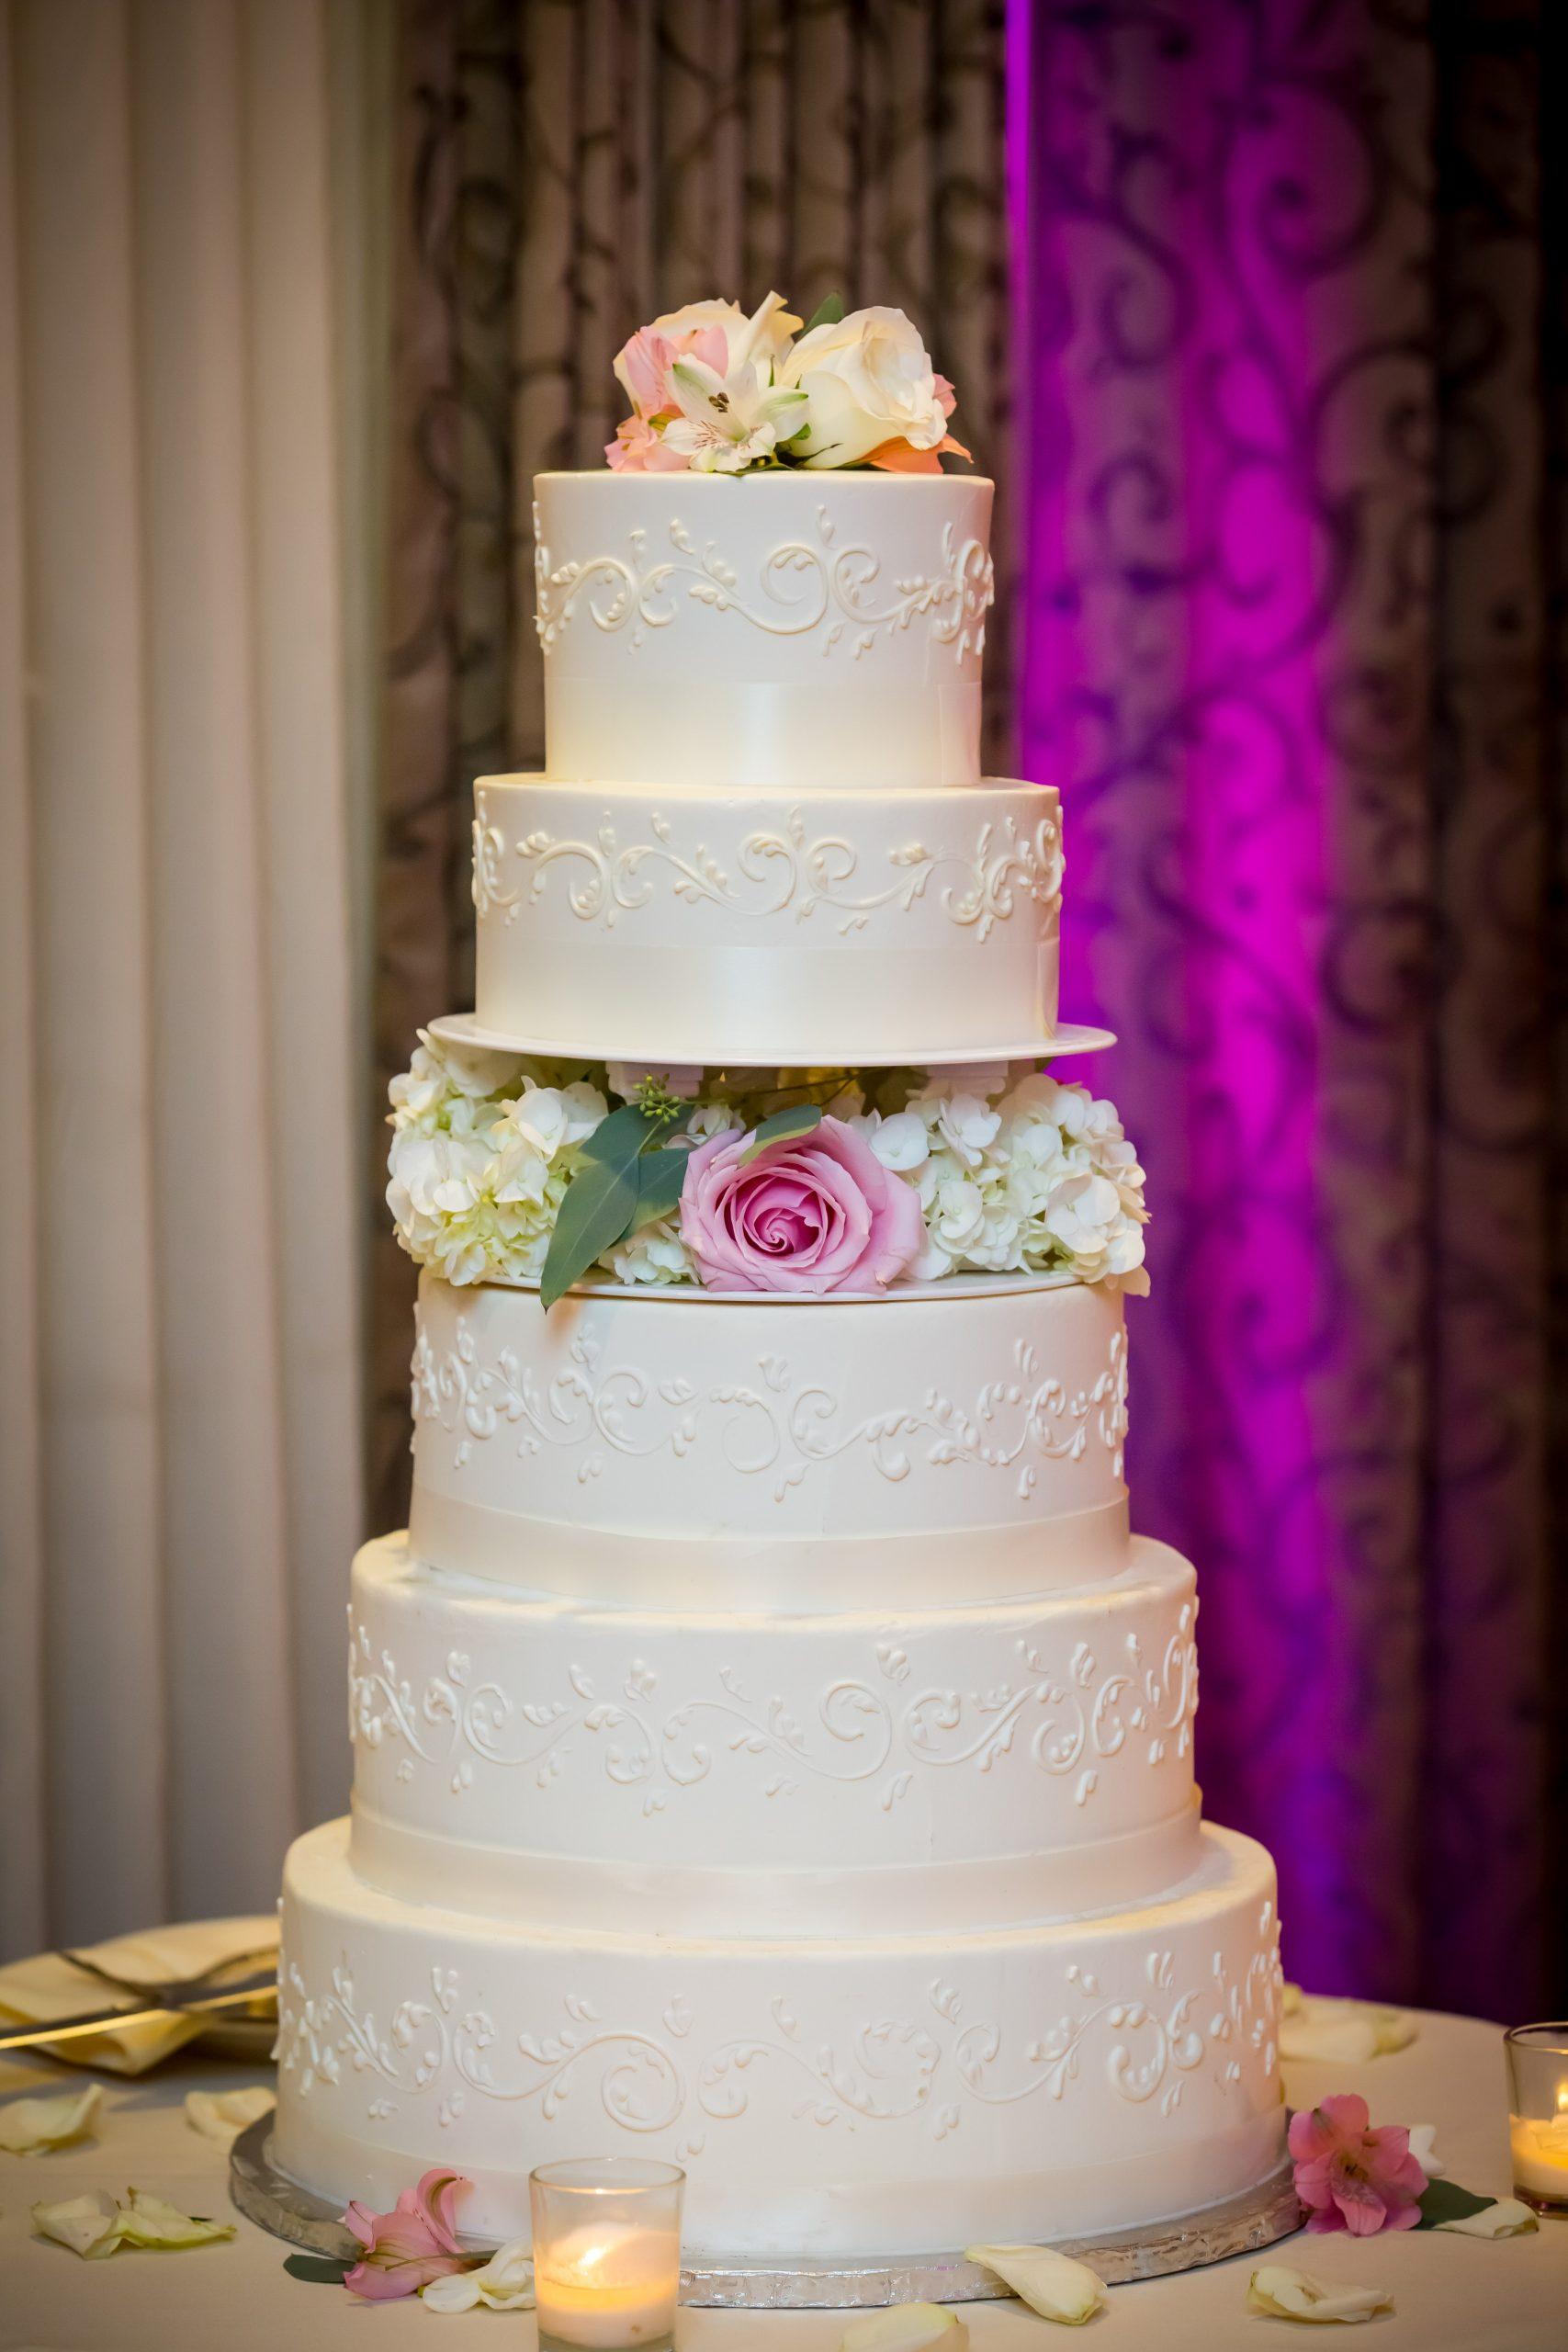 Victori_Rob_Mohawk River Country Club Wedding-56.jpg